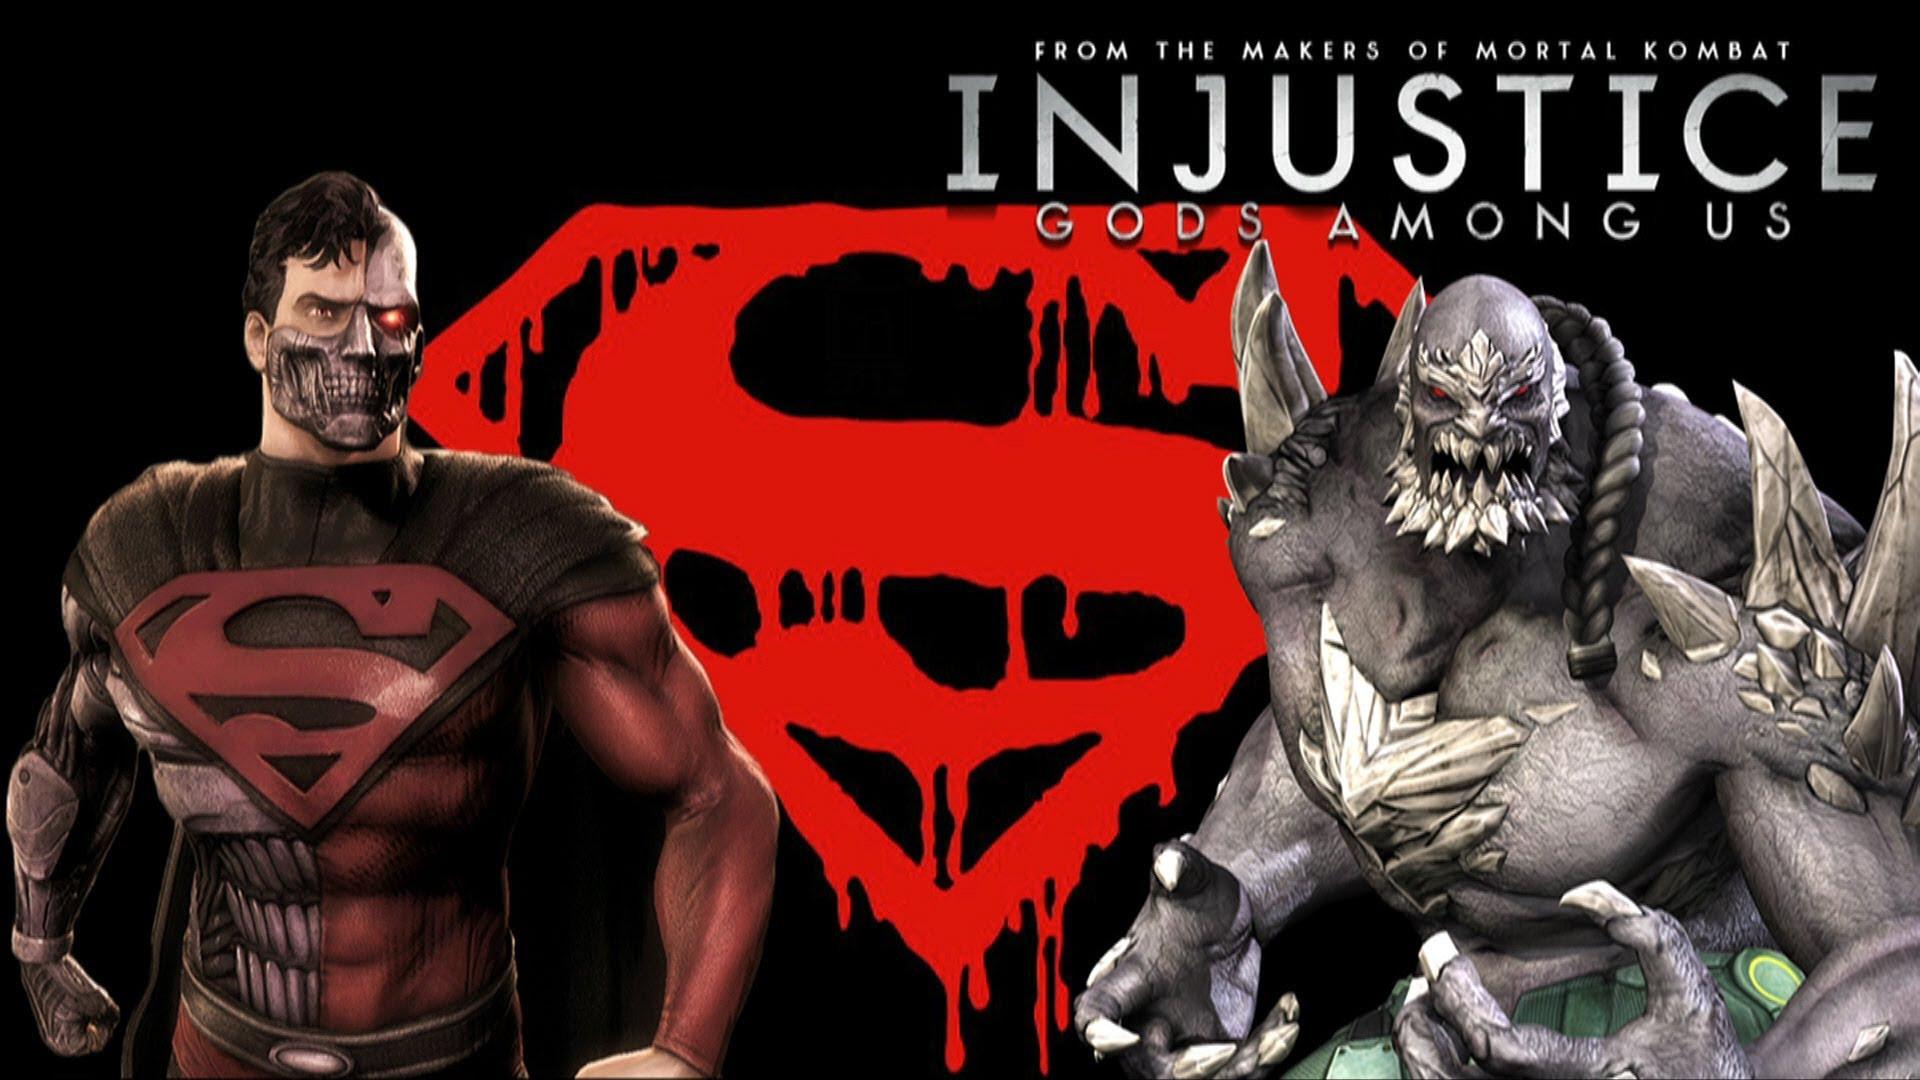 Res: 1920x1080, Injustice Gods Among Us Fresh Injustice Gods Among Us Cyborg Superman Vs  Doomsday with Lore Pics